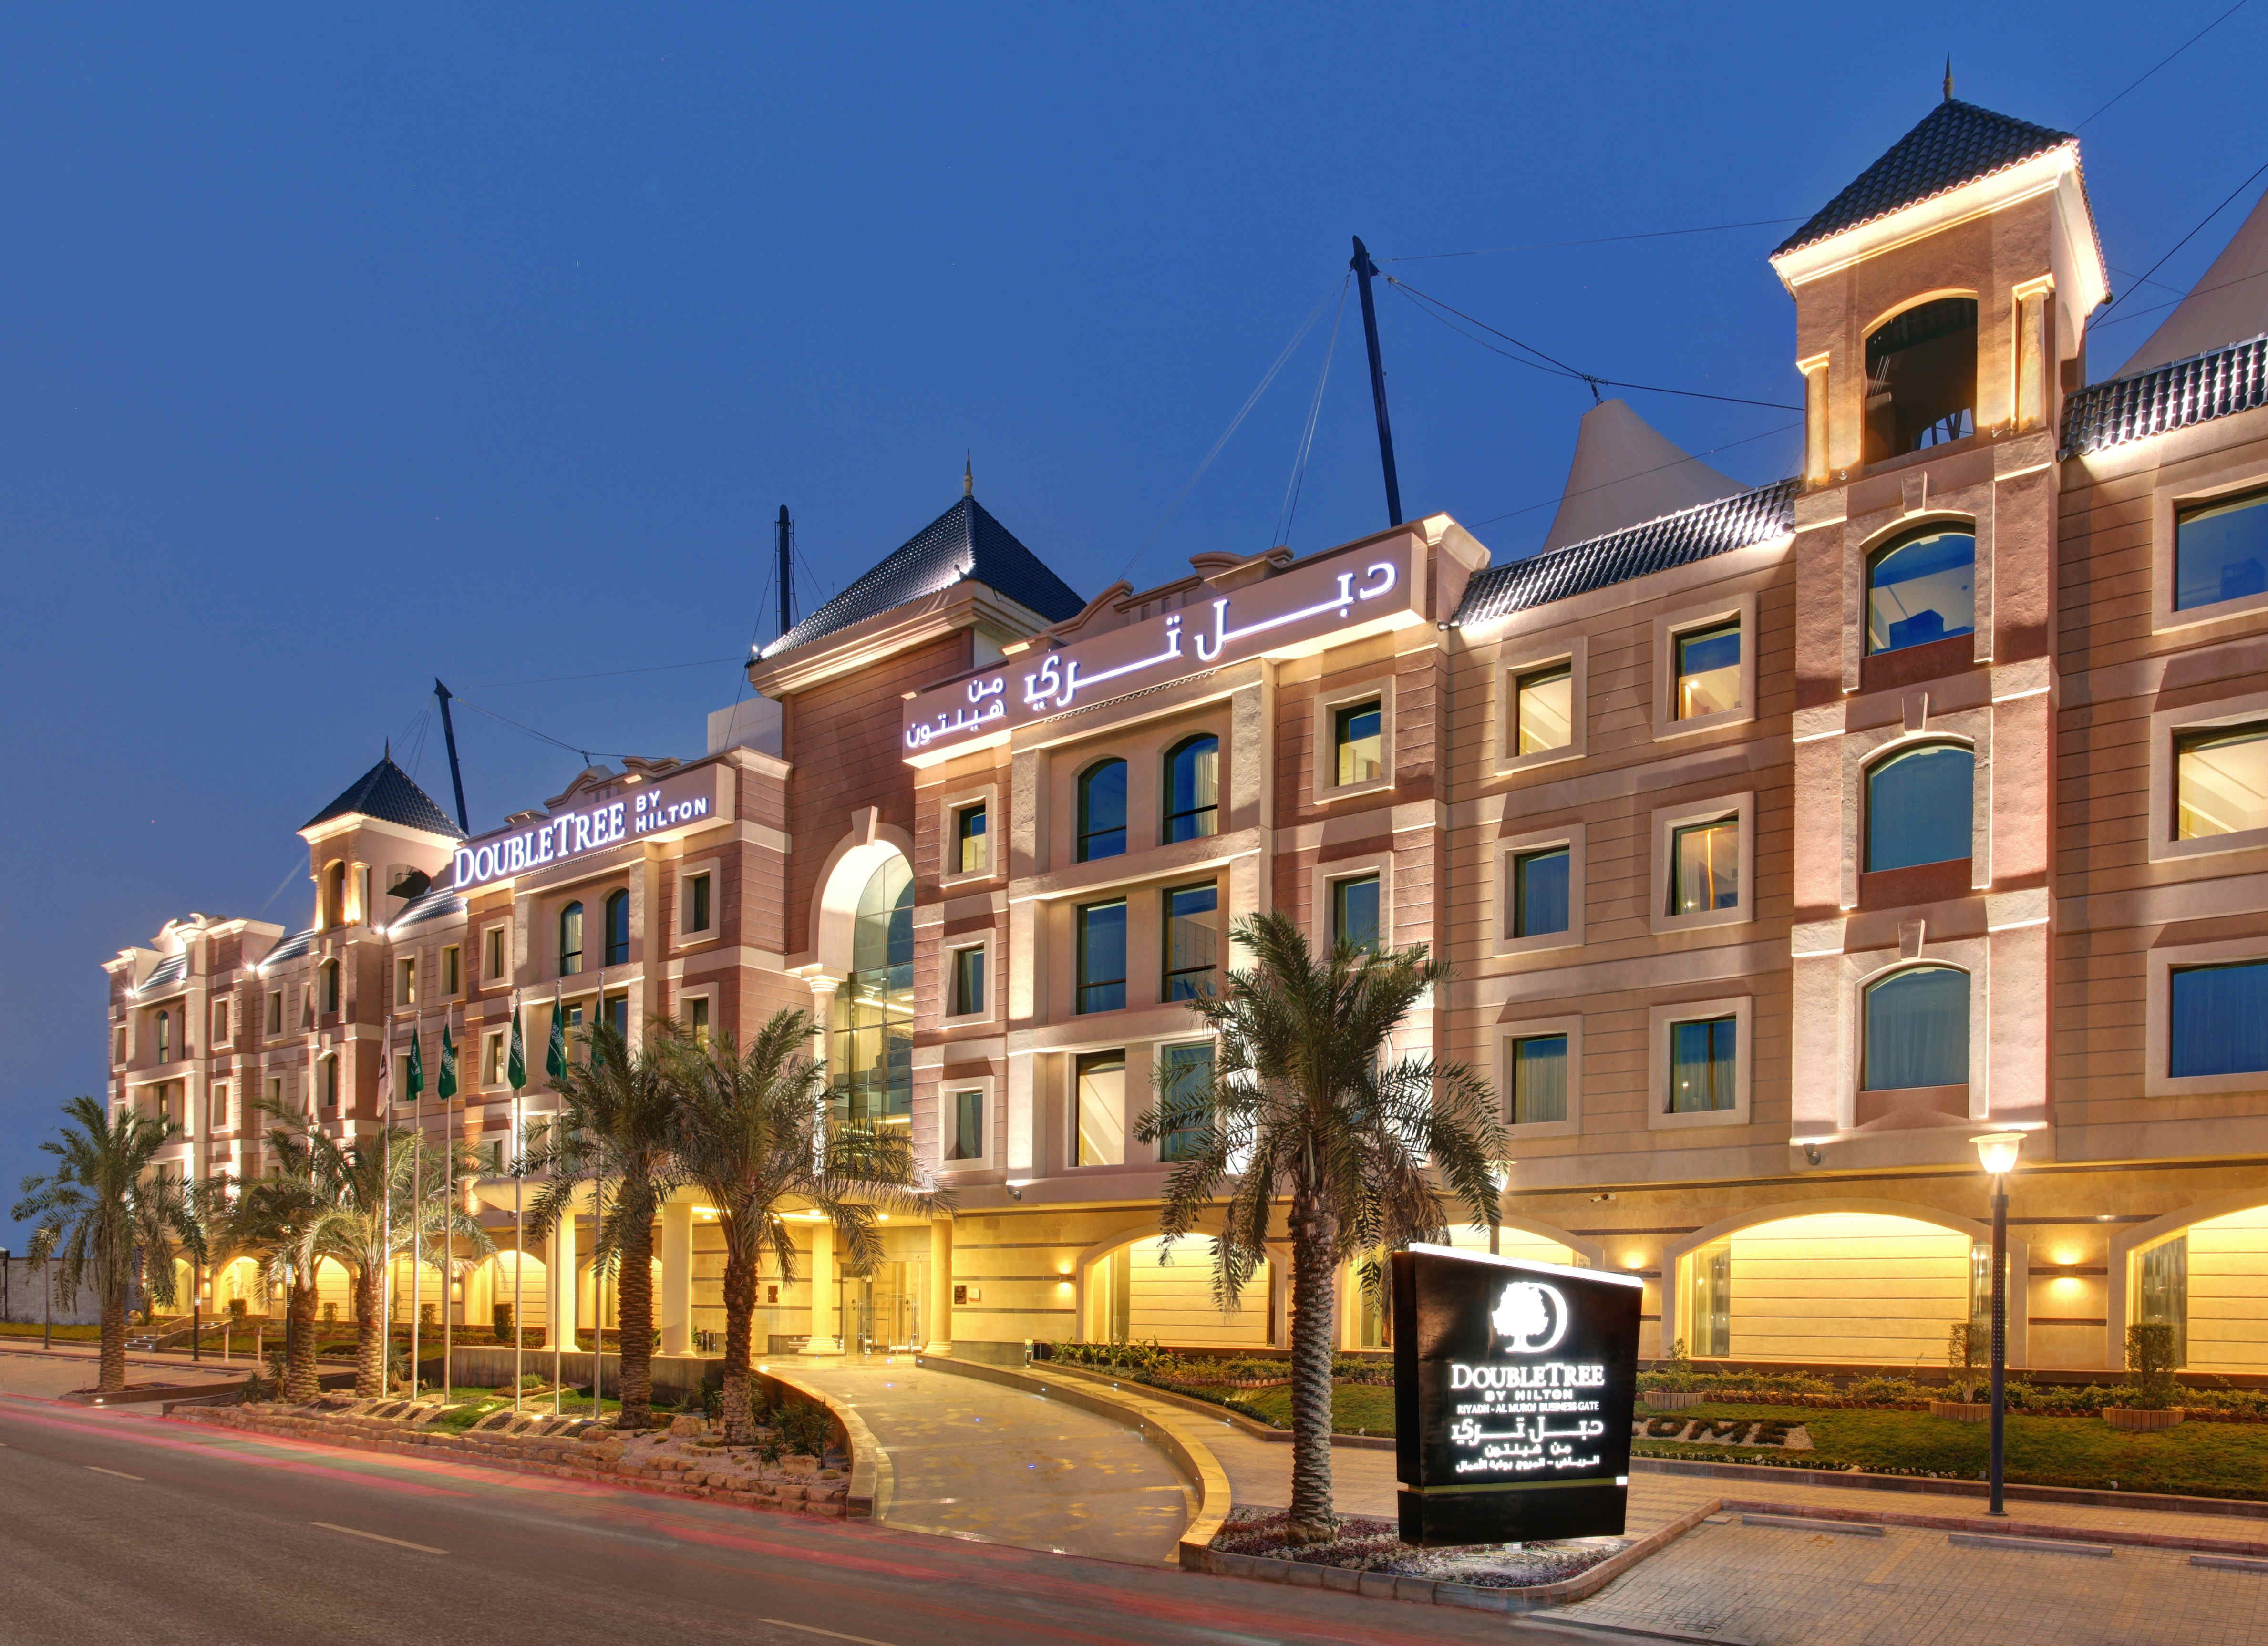 Hilton Double Tree Hotel فندق دبل تري من هلتون Hotel Hilton Hotel Saudi Arabia